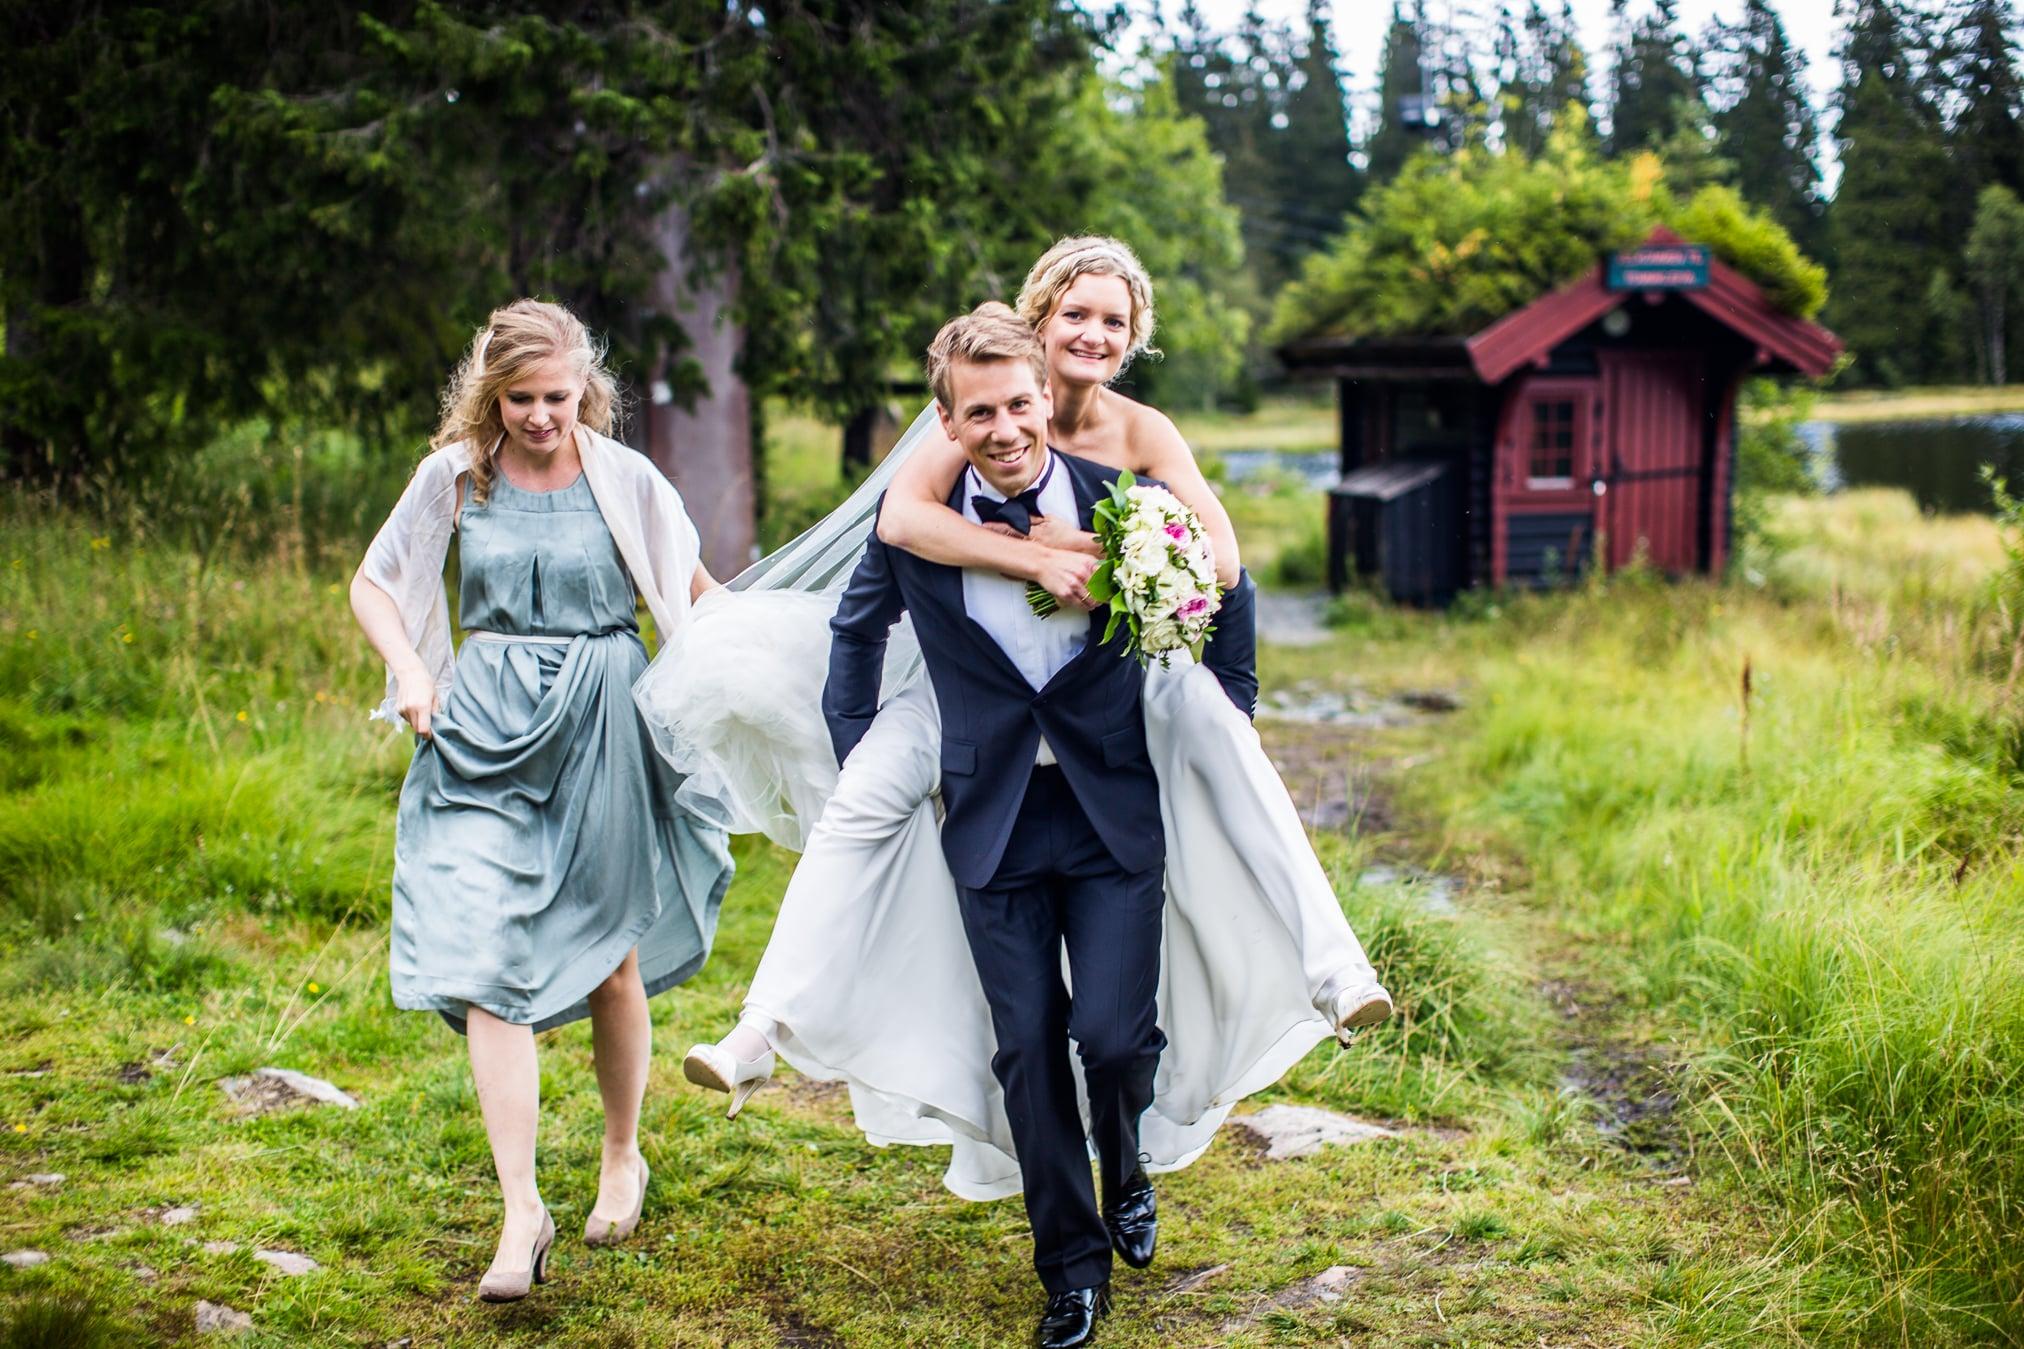 290815_fausko_oslo_lysebu_holmekollenkapell_øvresetertjern_nina&kristian_bryllup-53.jpg